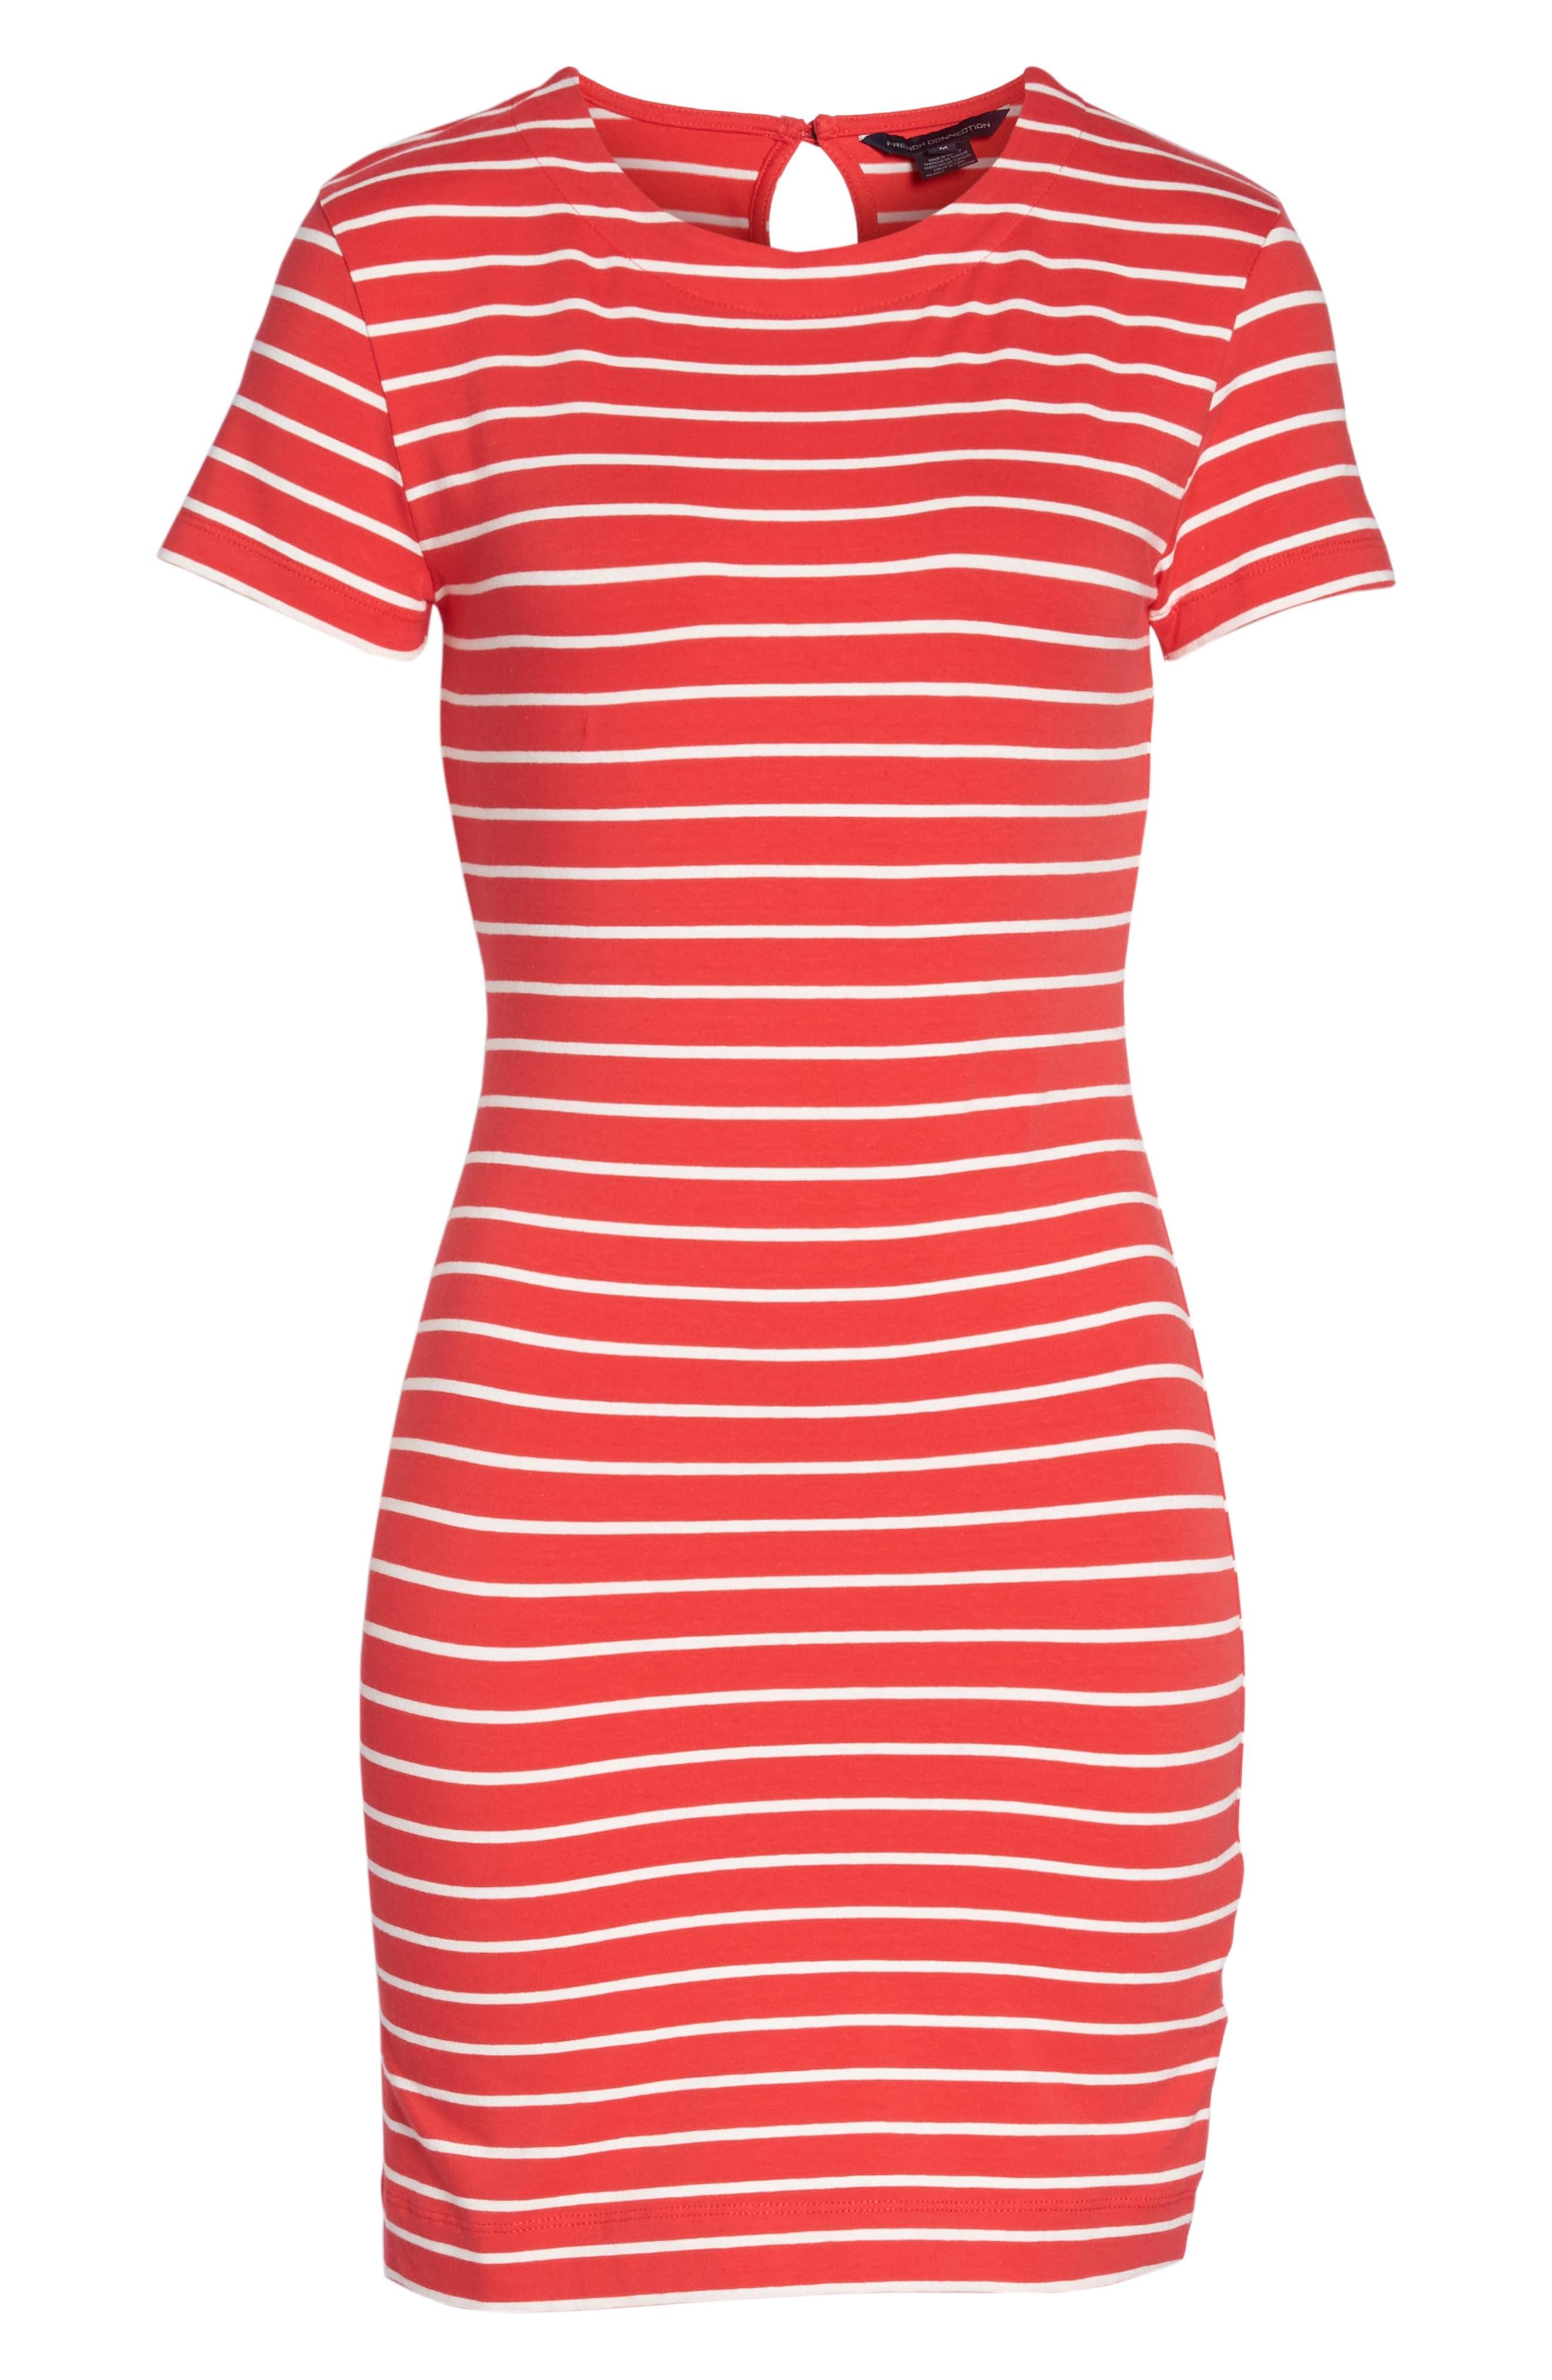 Knit Stripe Body-Con Dress,                             Alternate thumbnail 7, color,                             Shanghai Red/ Summer White